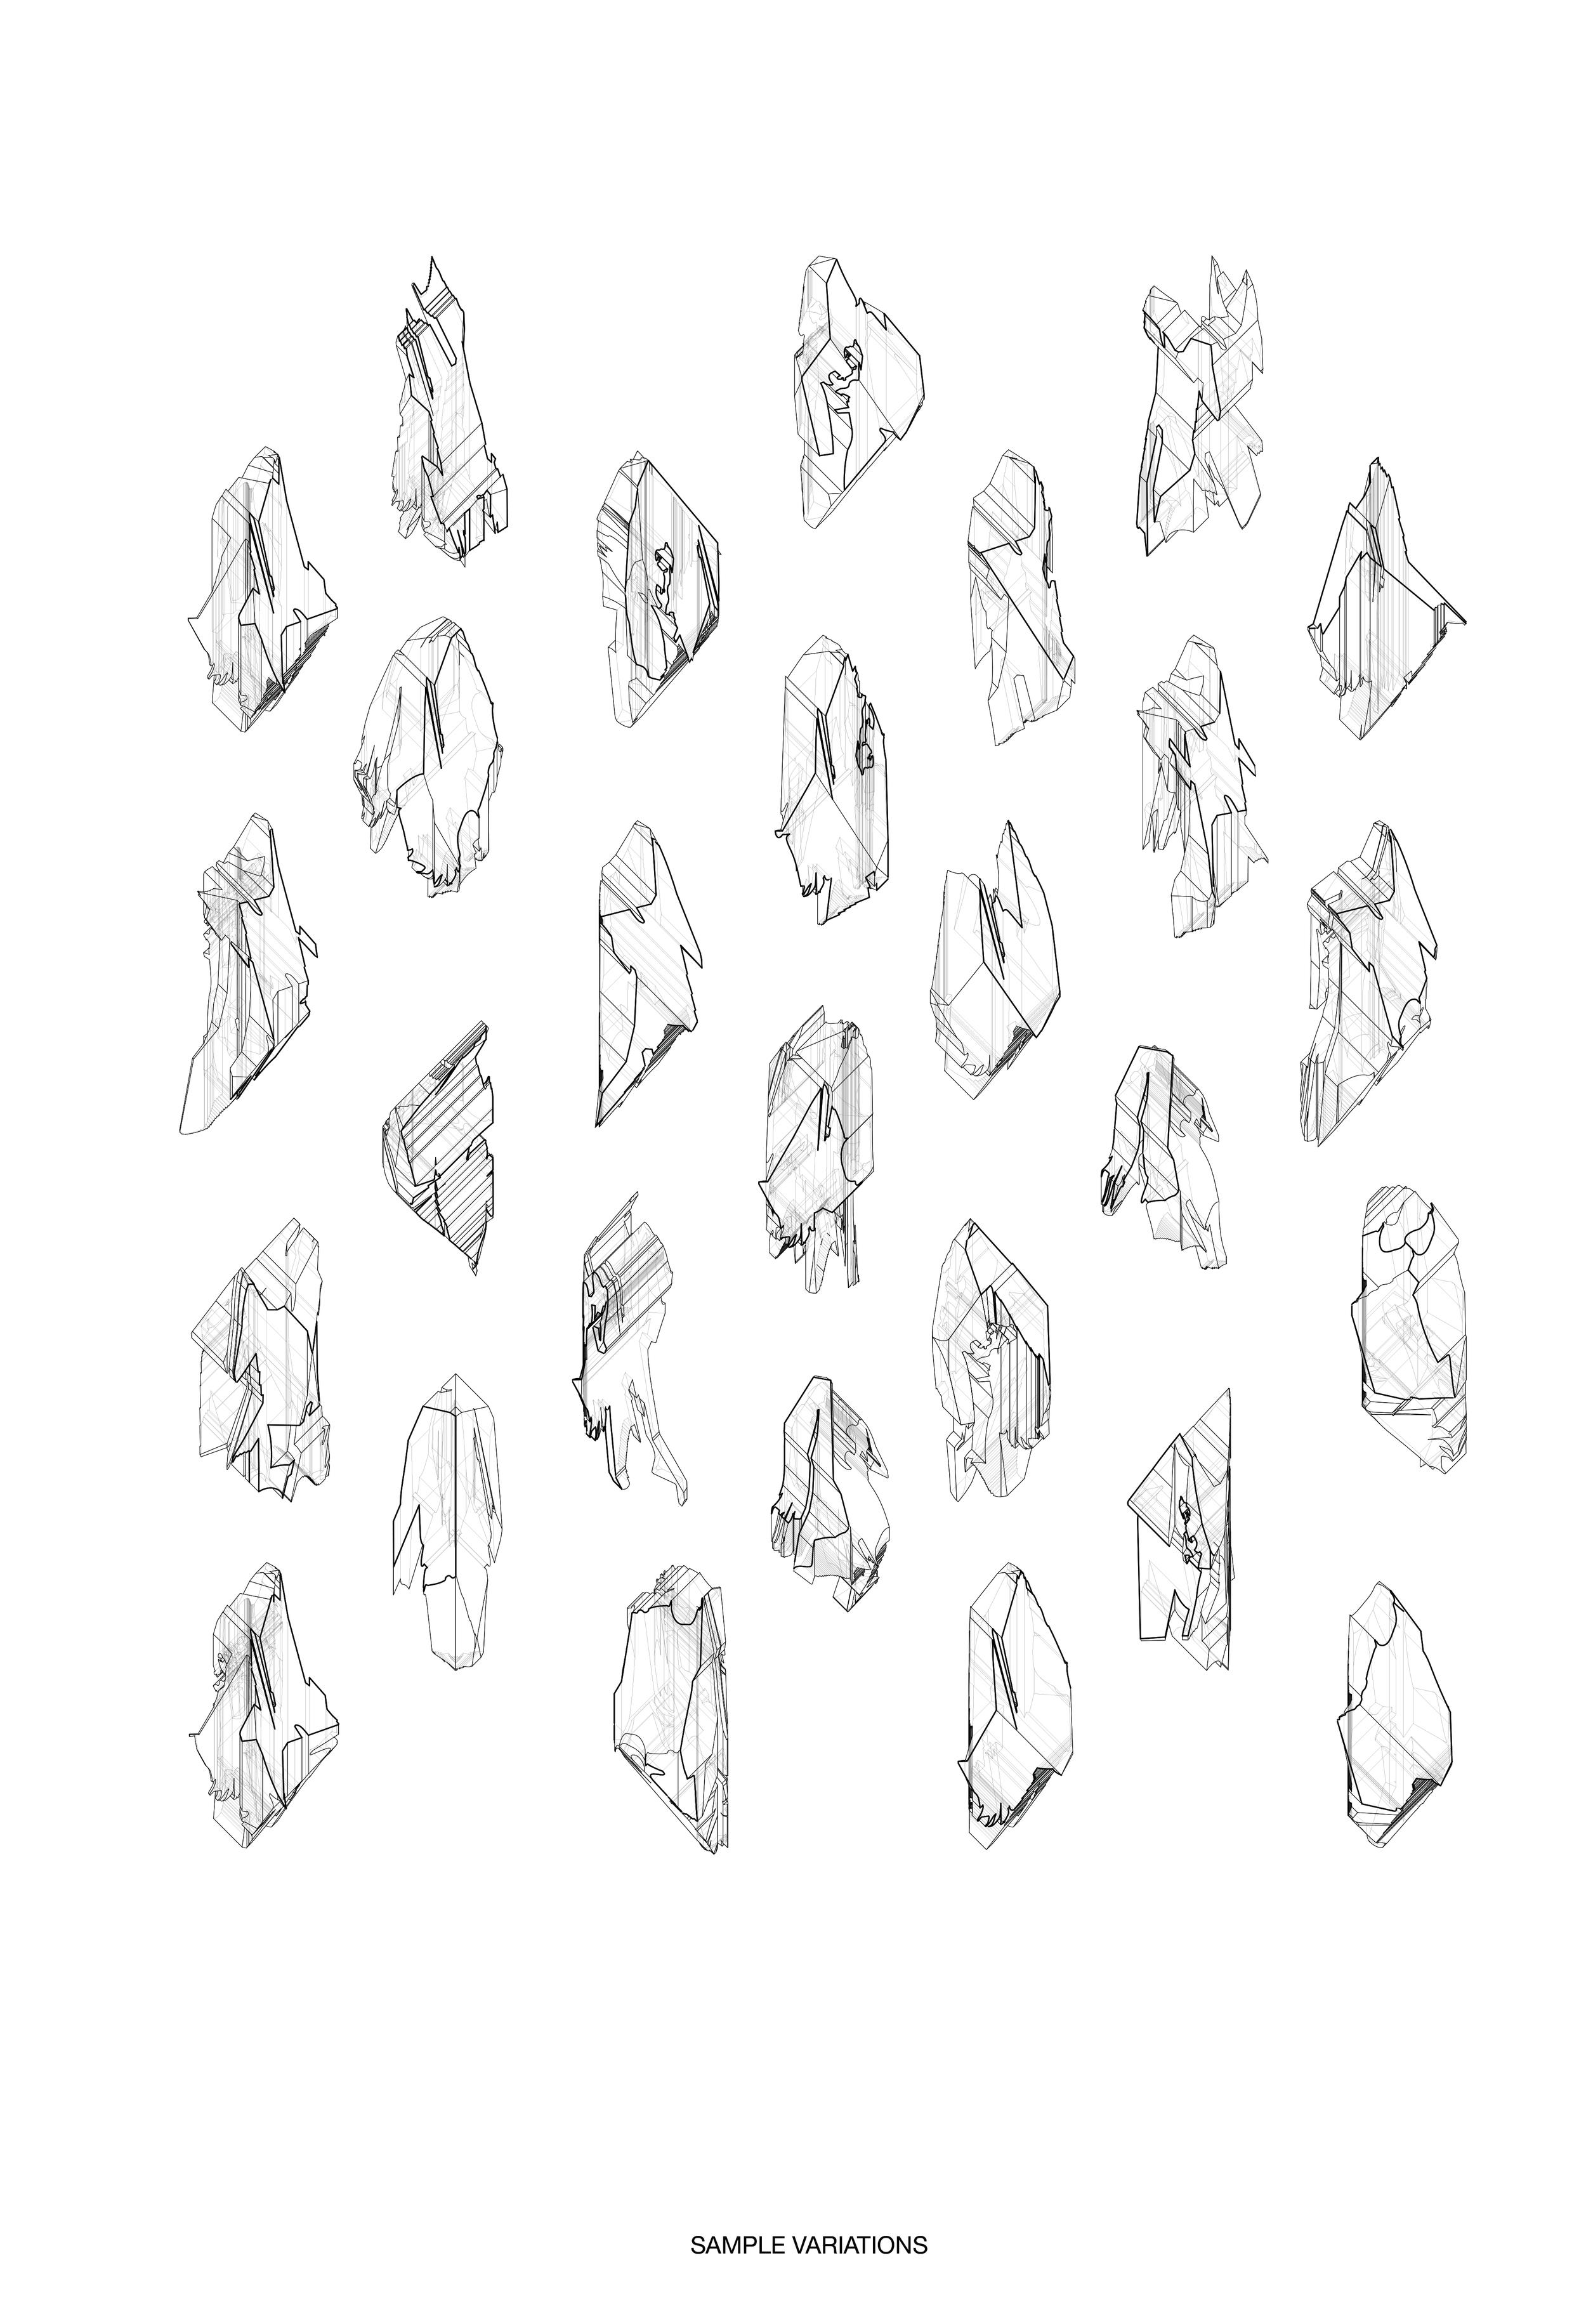 3288_Sample Variations.jpg